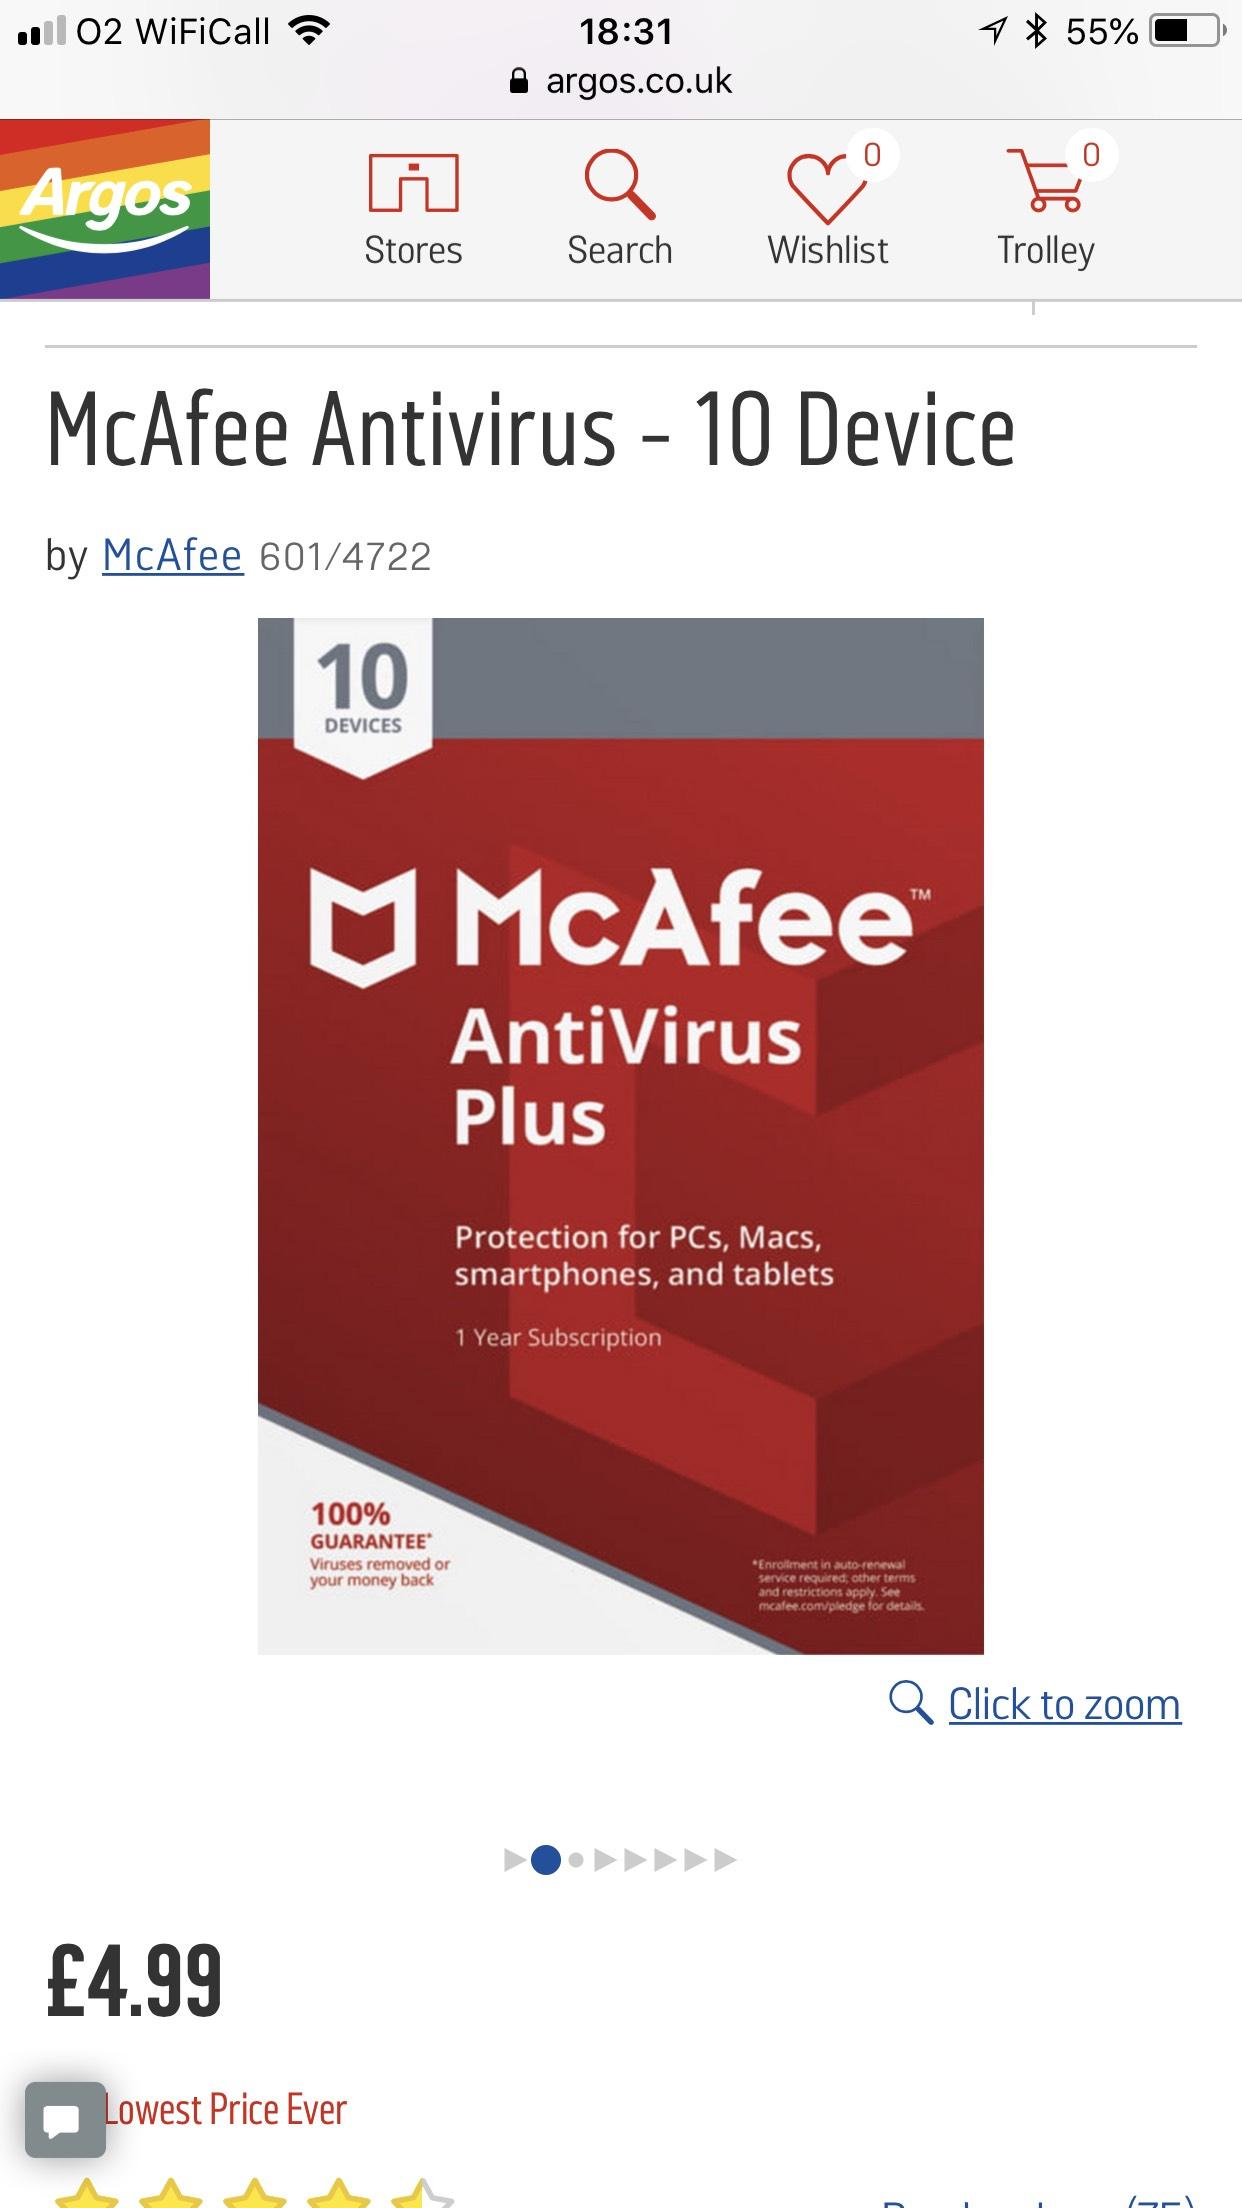 McAfee Antivirus - 10 Device £4.99 @ Argos (C&C)